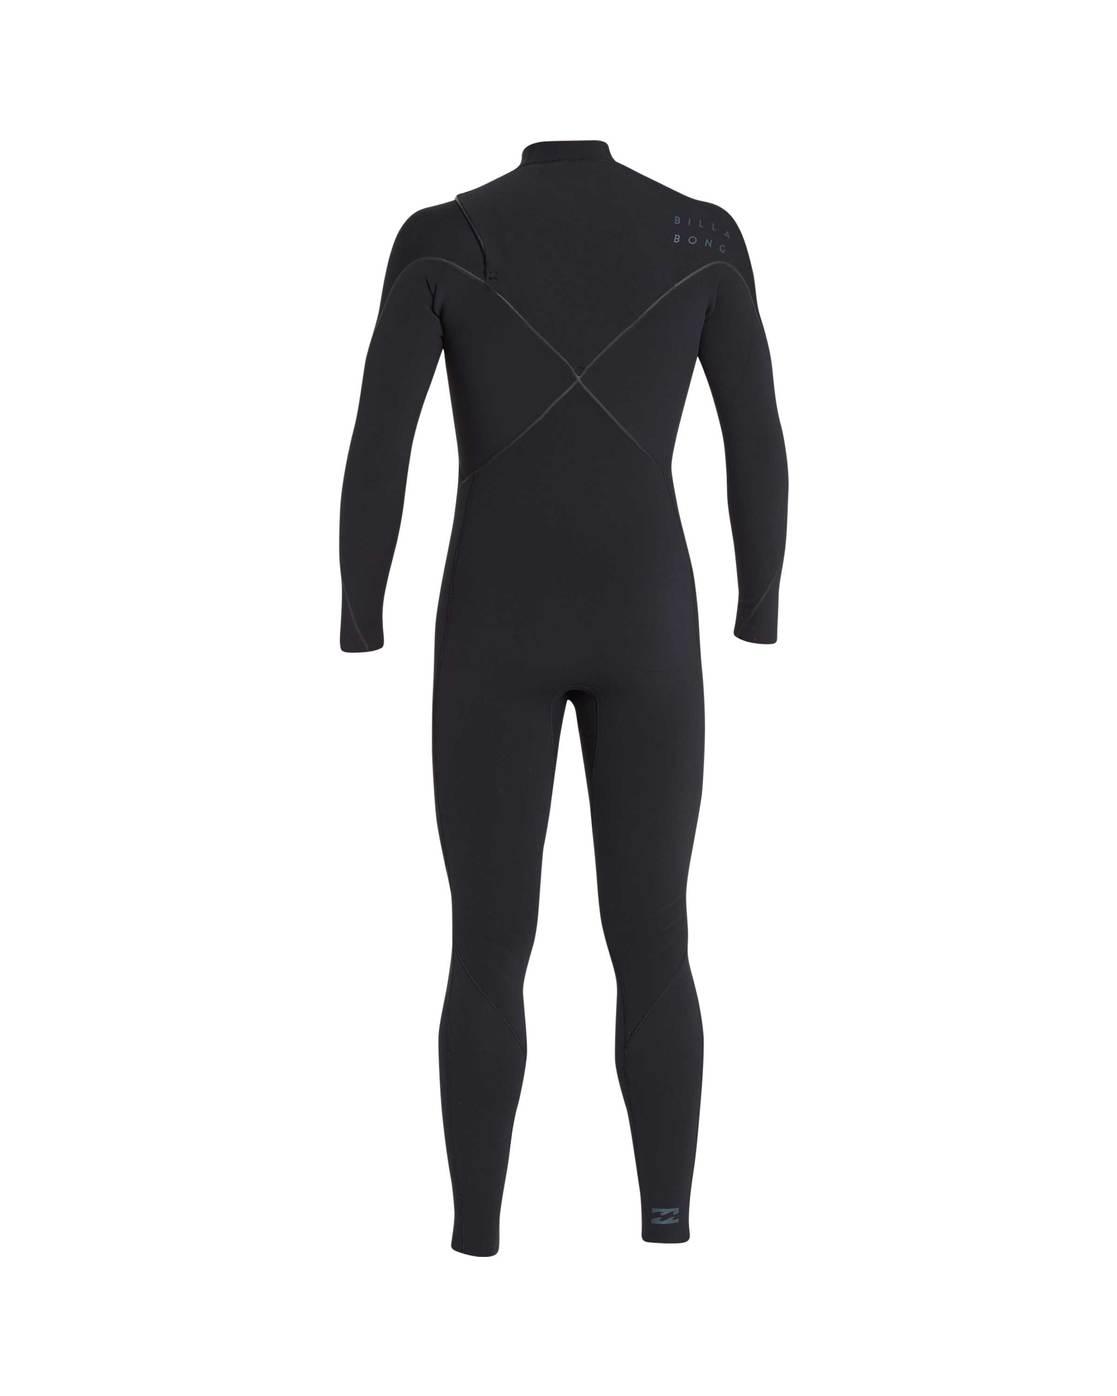 5 4 Furnace Carbon Comp Zipperless Fullsuit Wetsuit